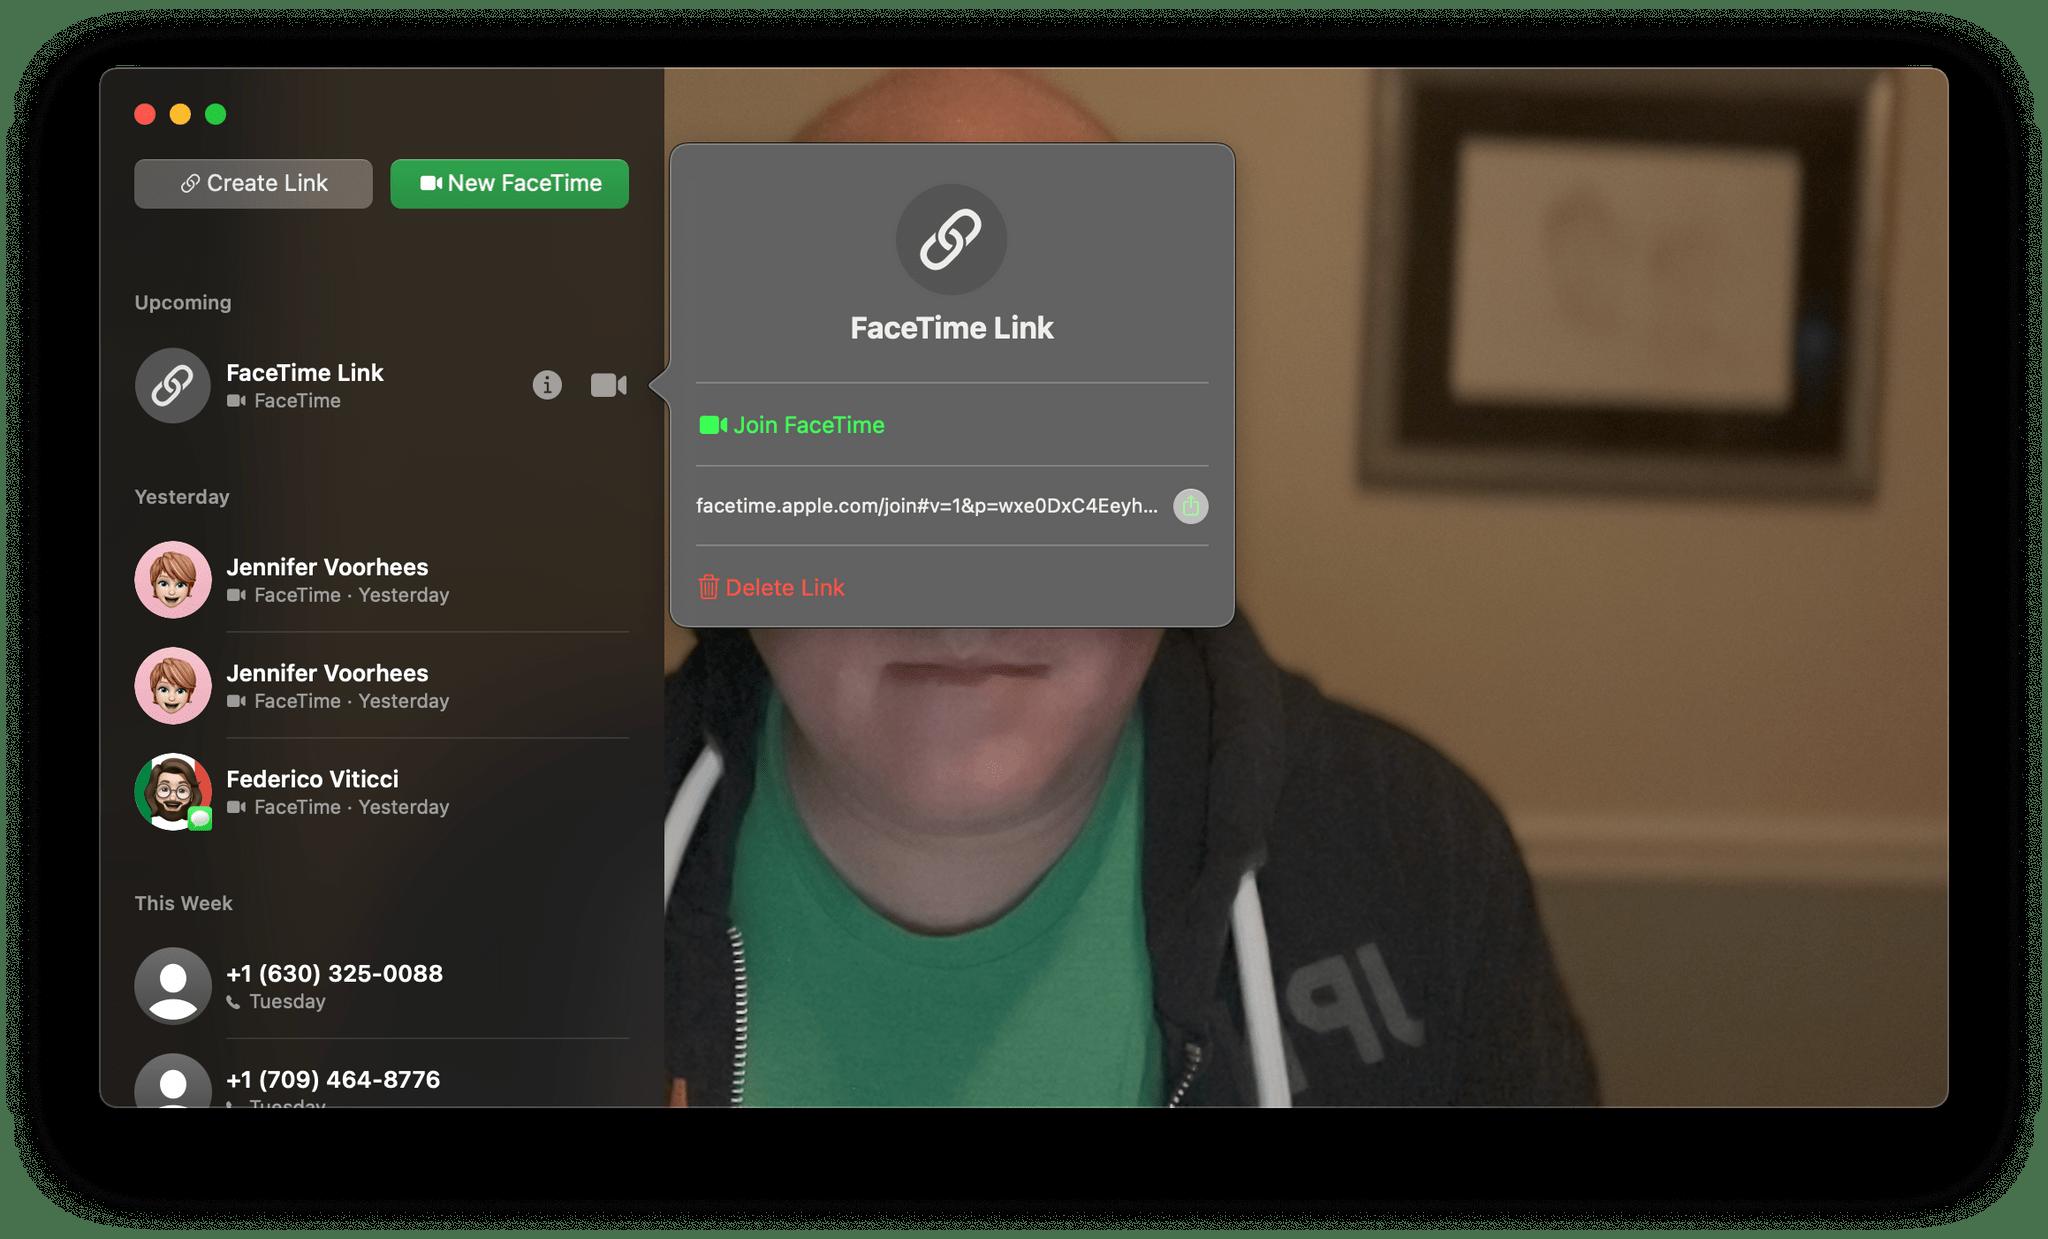 Managing FaceTime links inside the app.